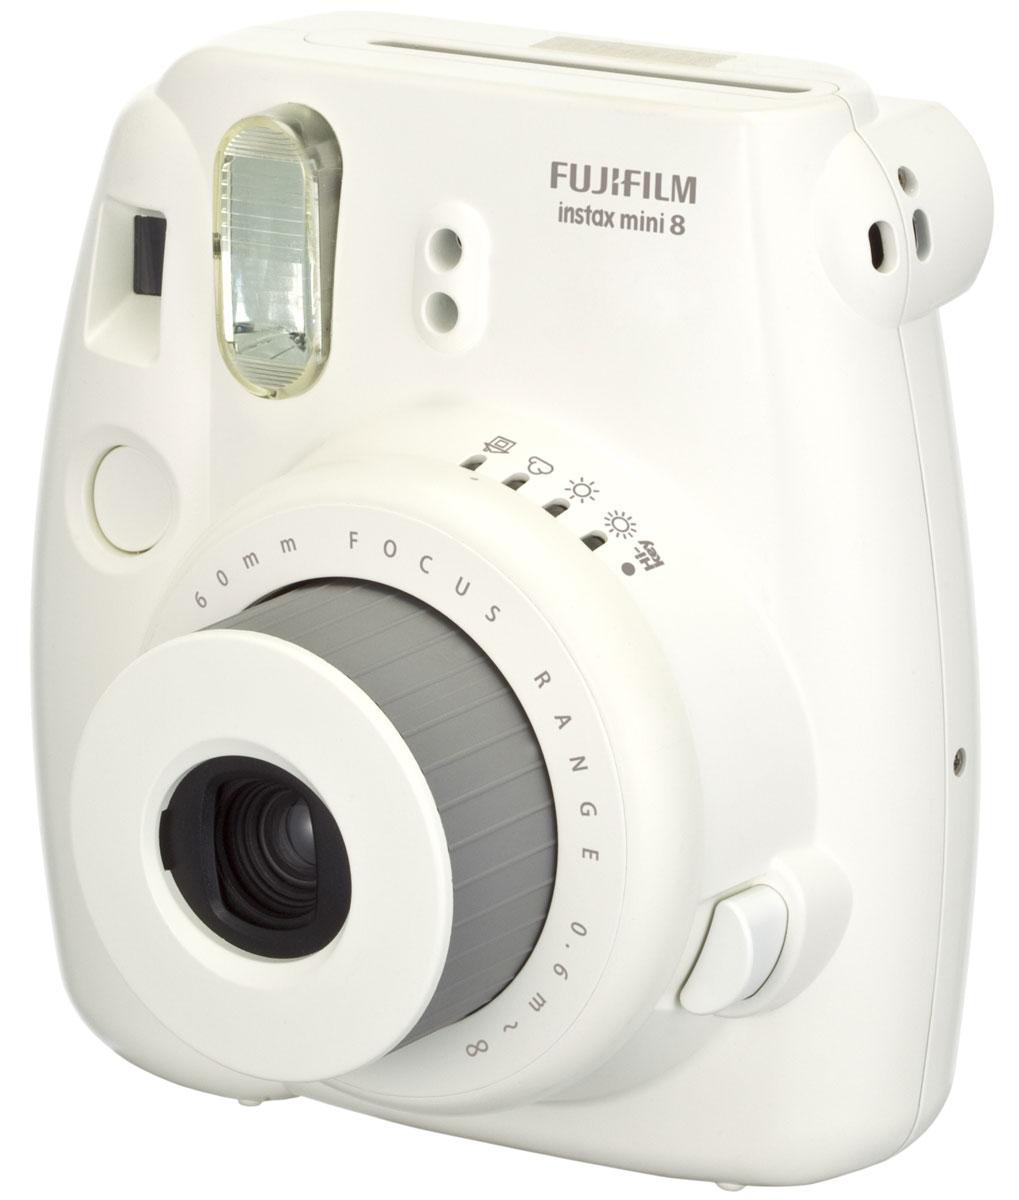 Fujifilm Instax Mini 8, White фотоаппарат - Цифровые фотоаппараты